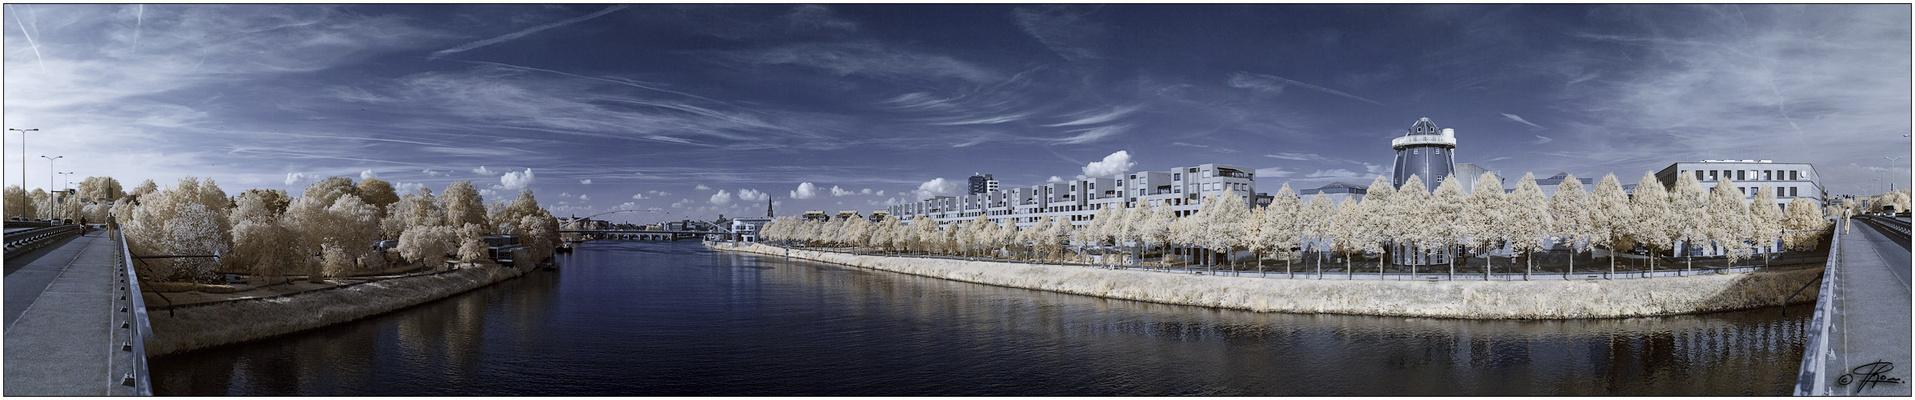 Maastricht - Infrarot